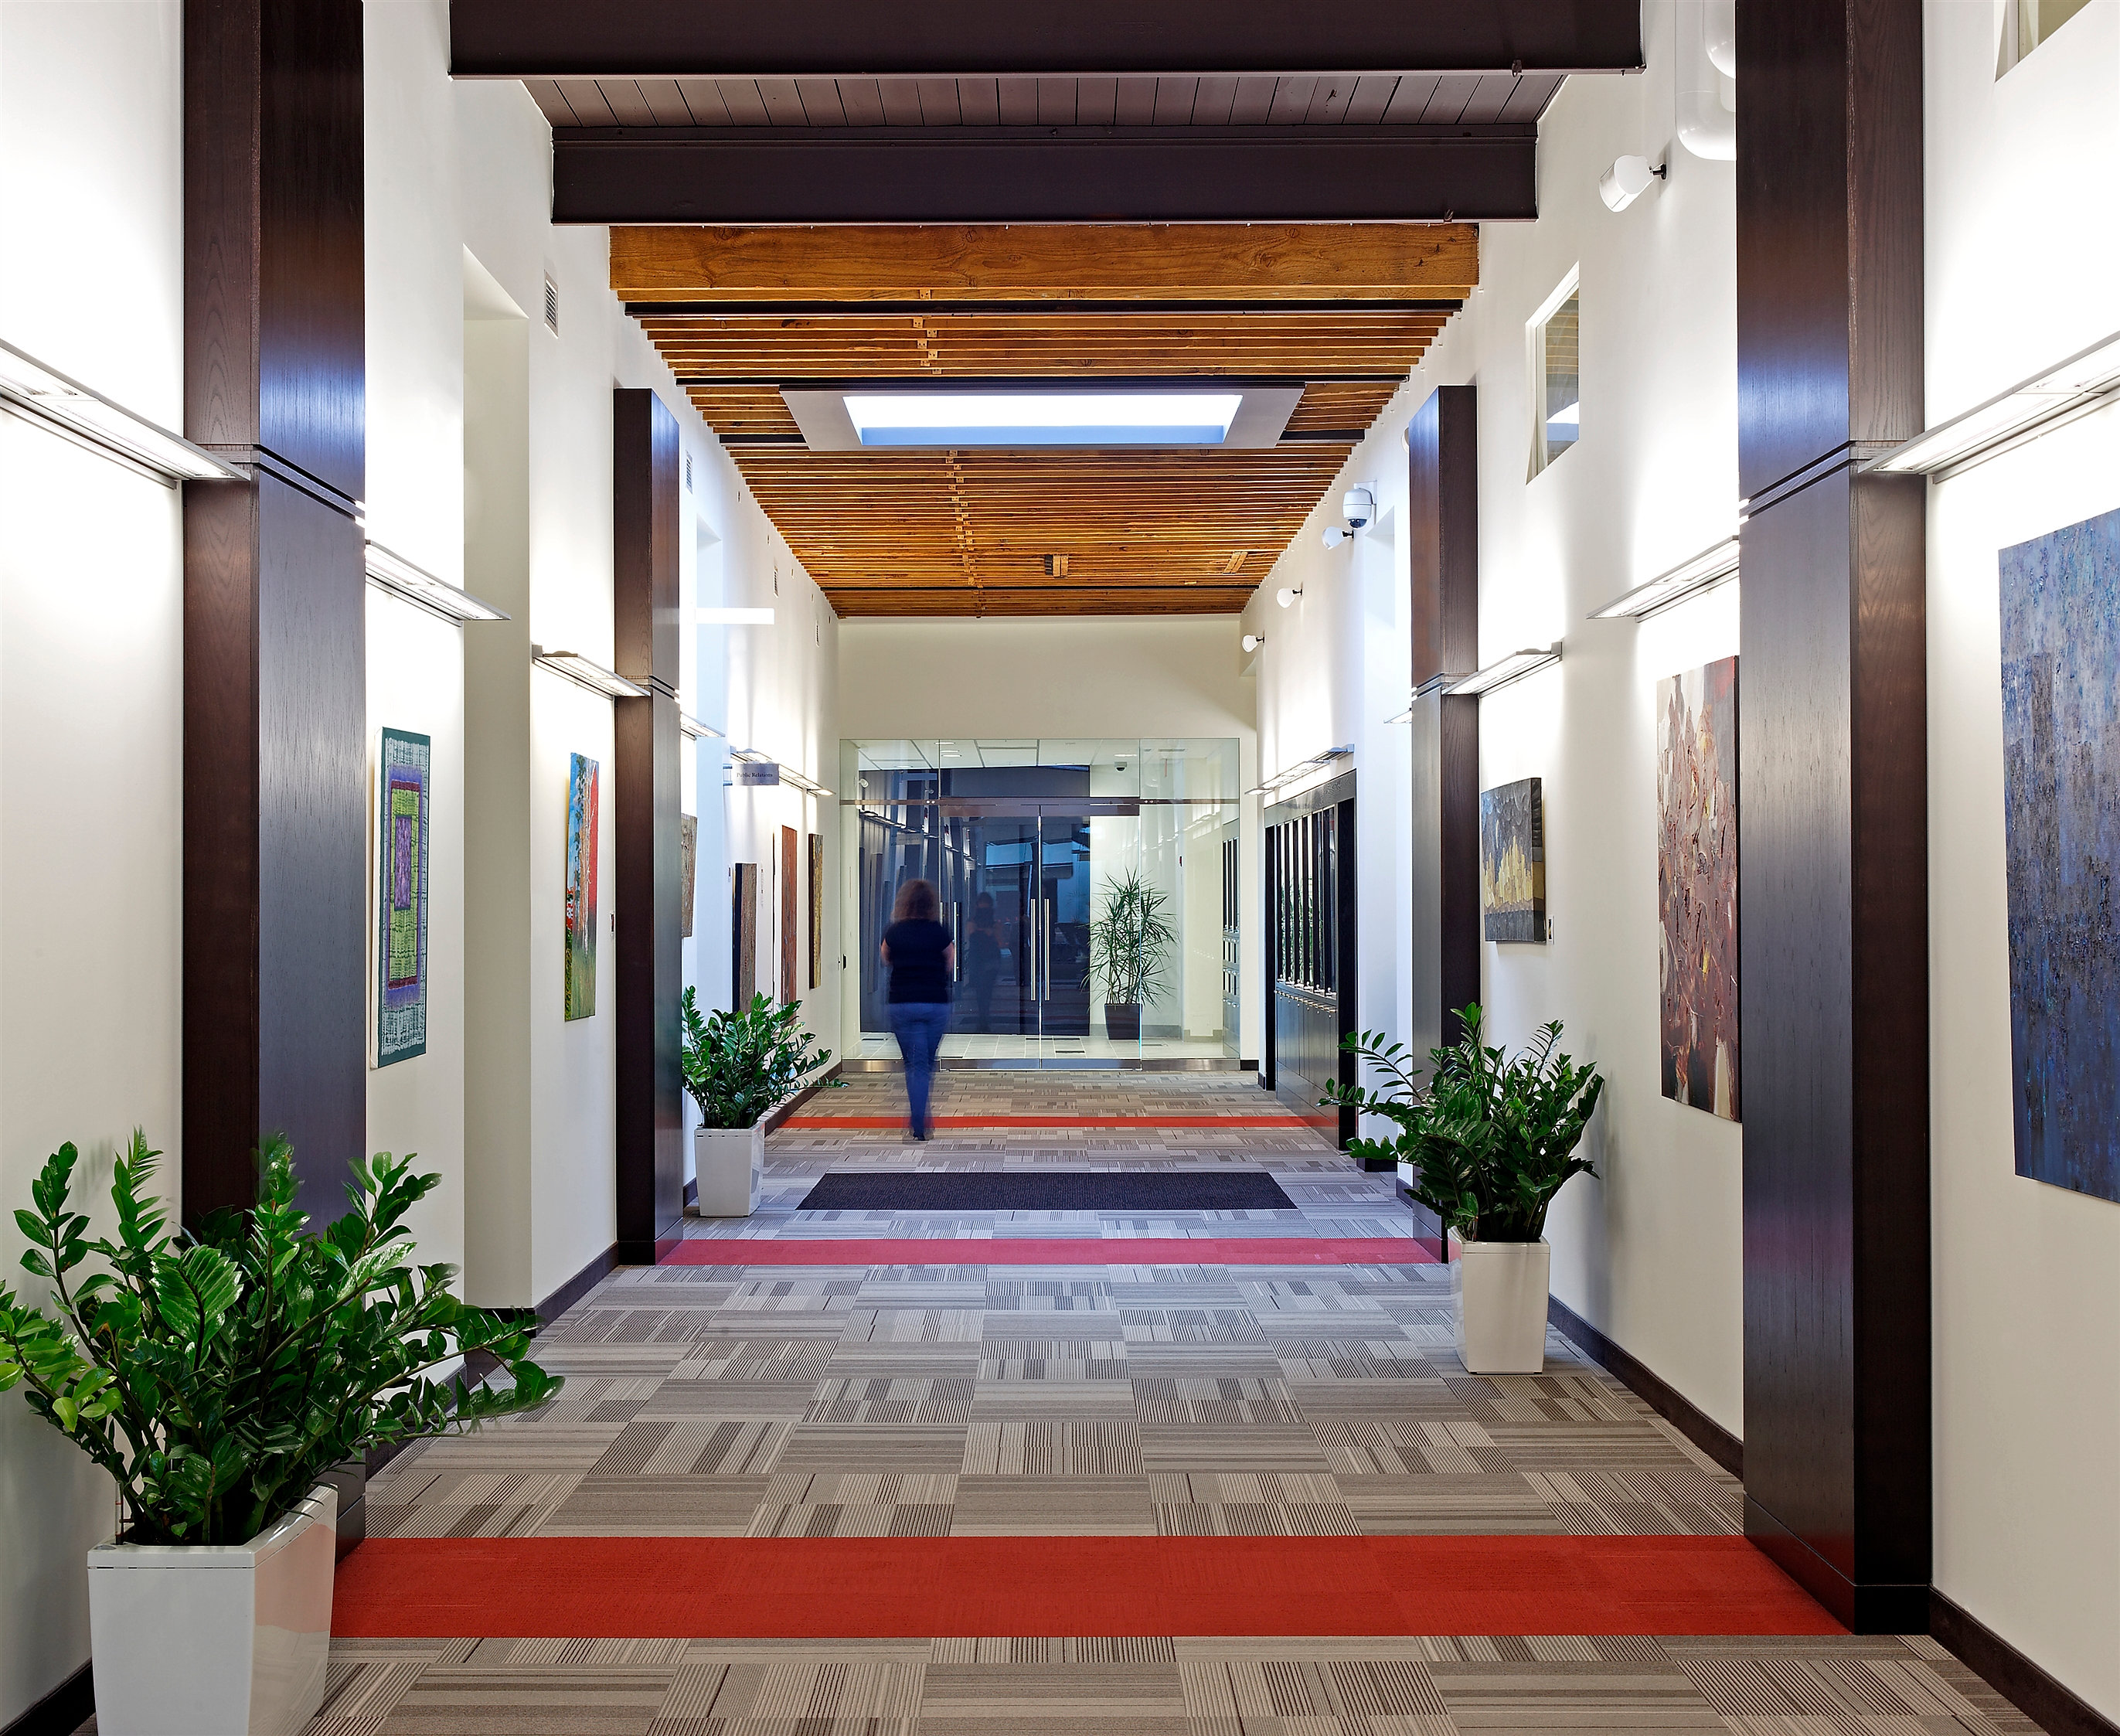 Csa office hallway for Office hallway design